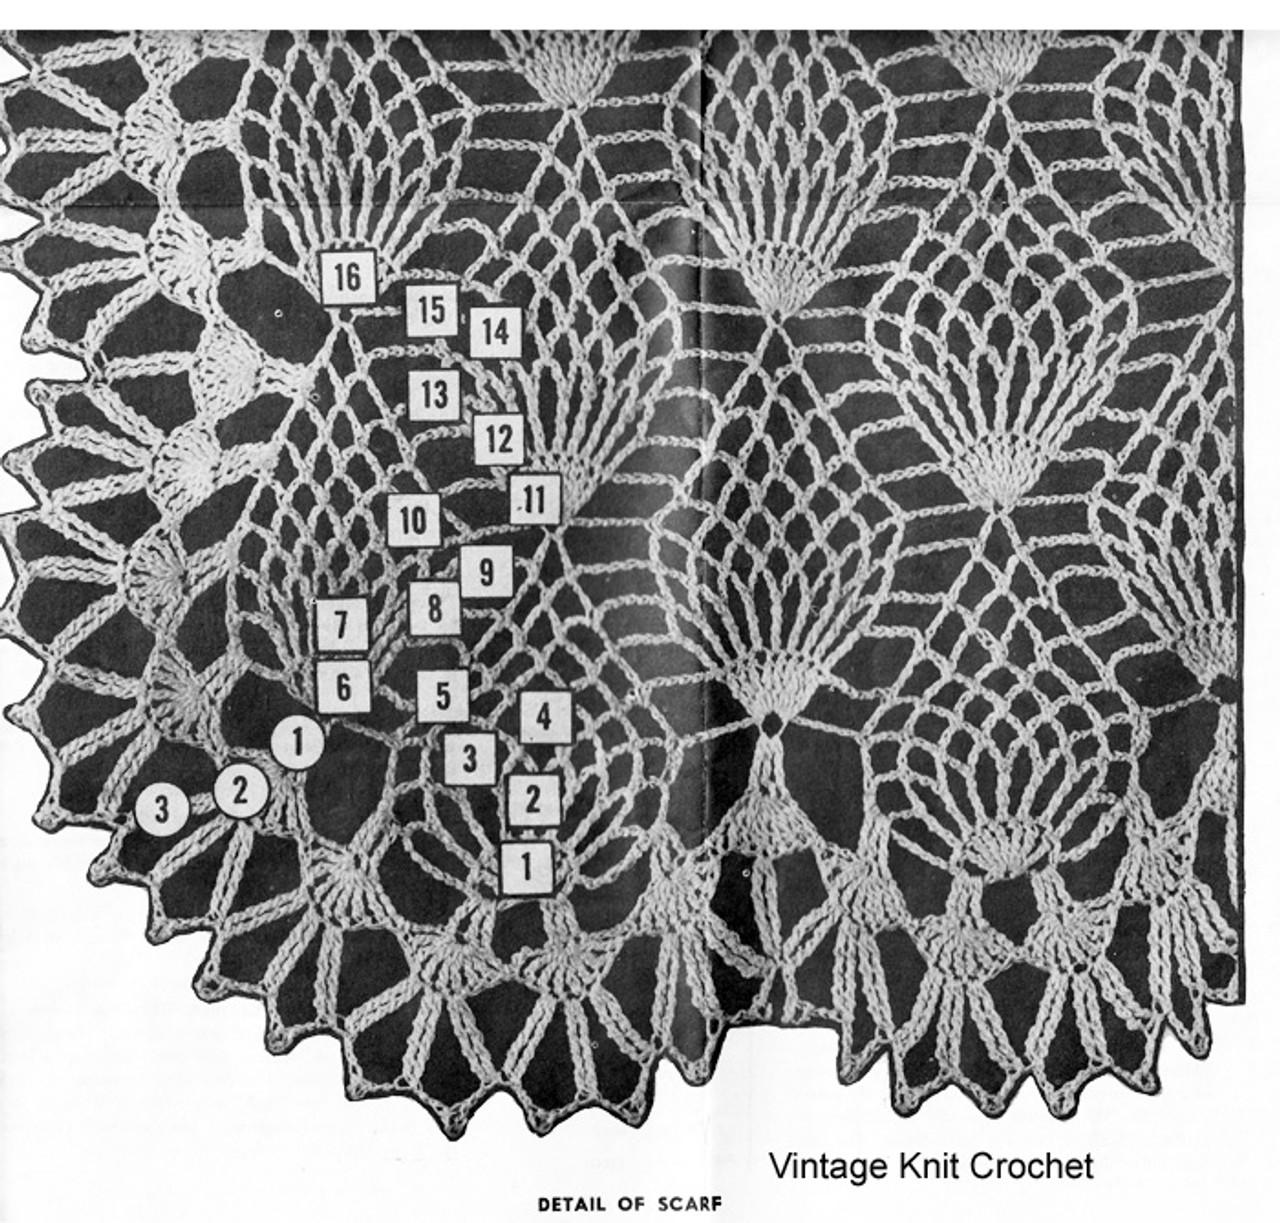 Pineapple Scarf Pattern Stitch Illustration, Design 7171